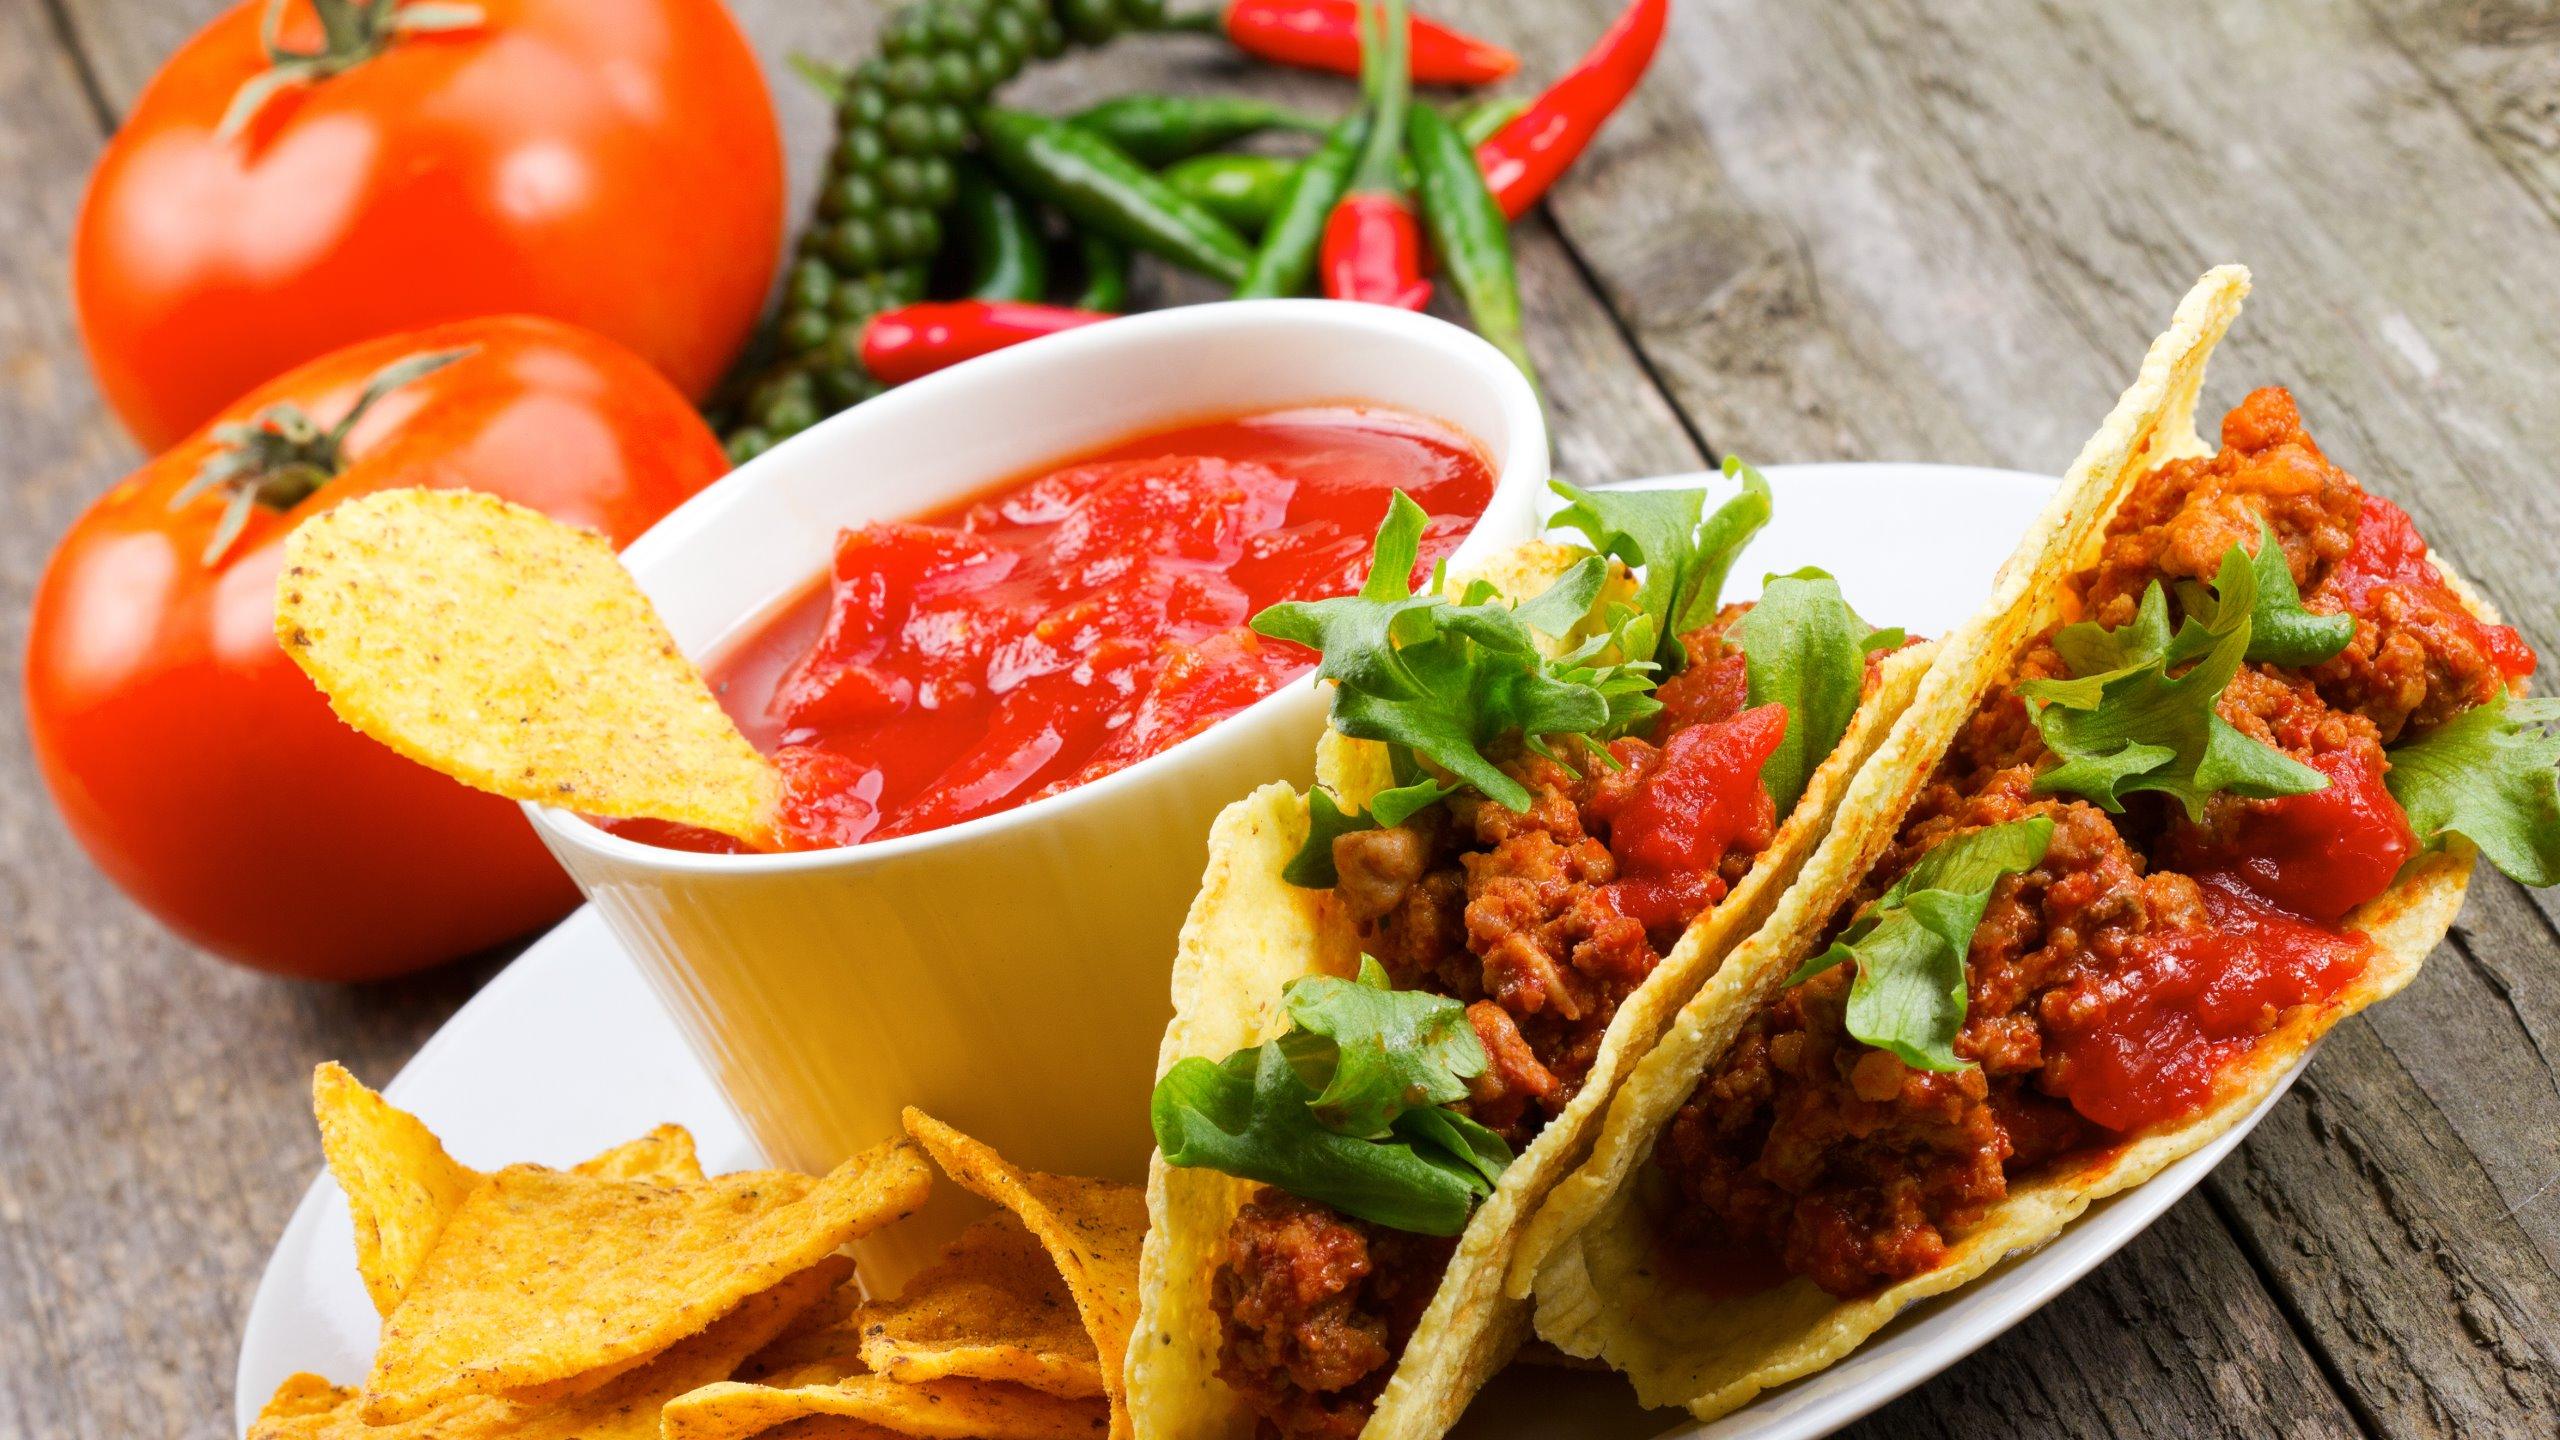 Recetas de comida casera mexicana imperdibles mil recetas for Resetas para comidas